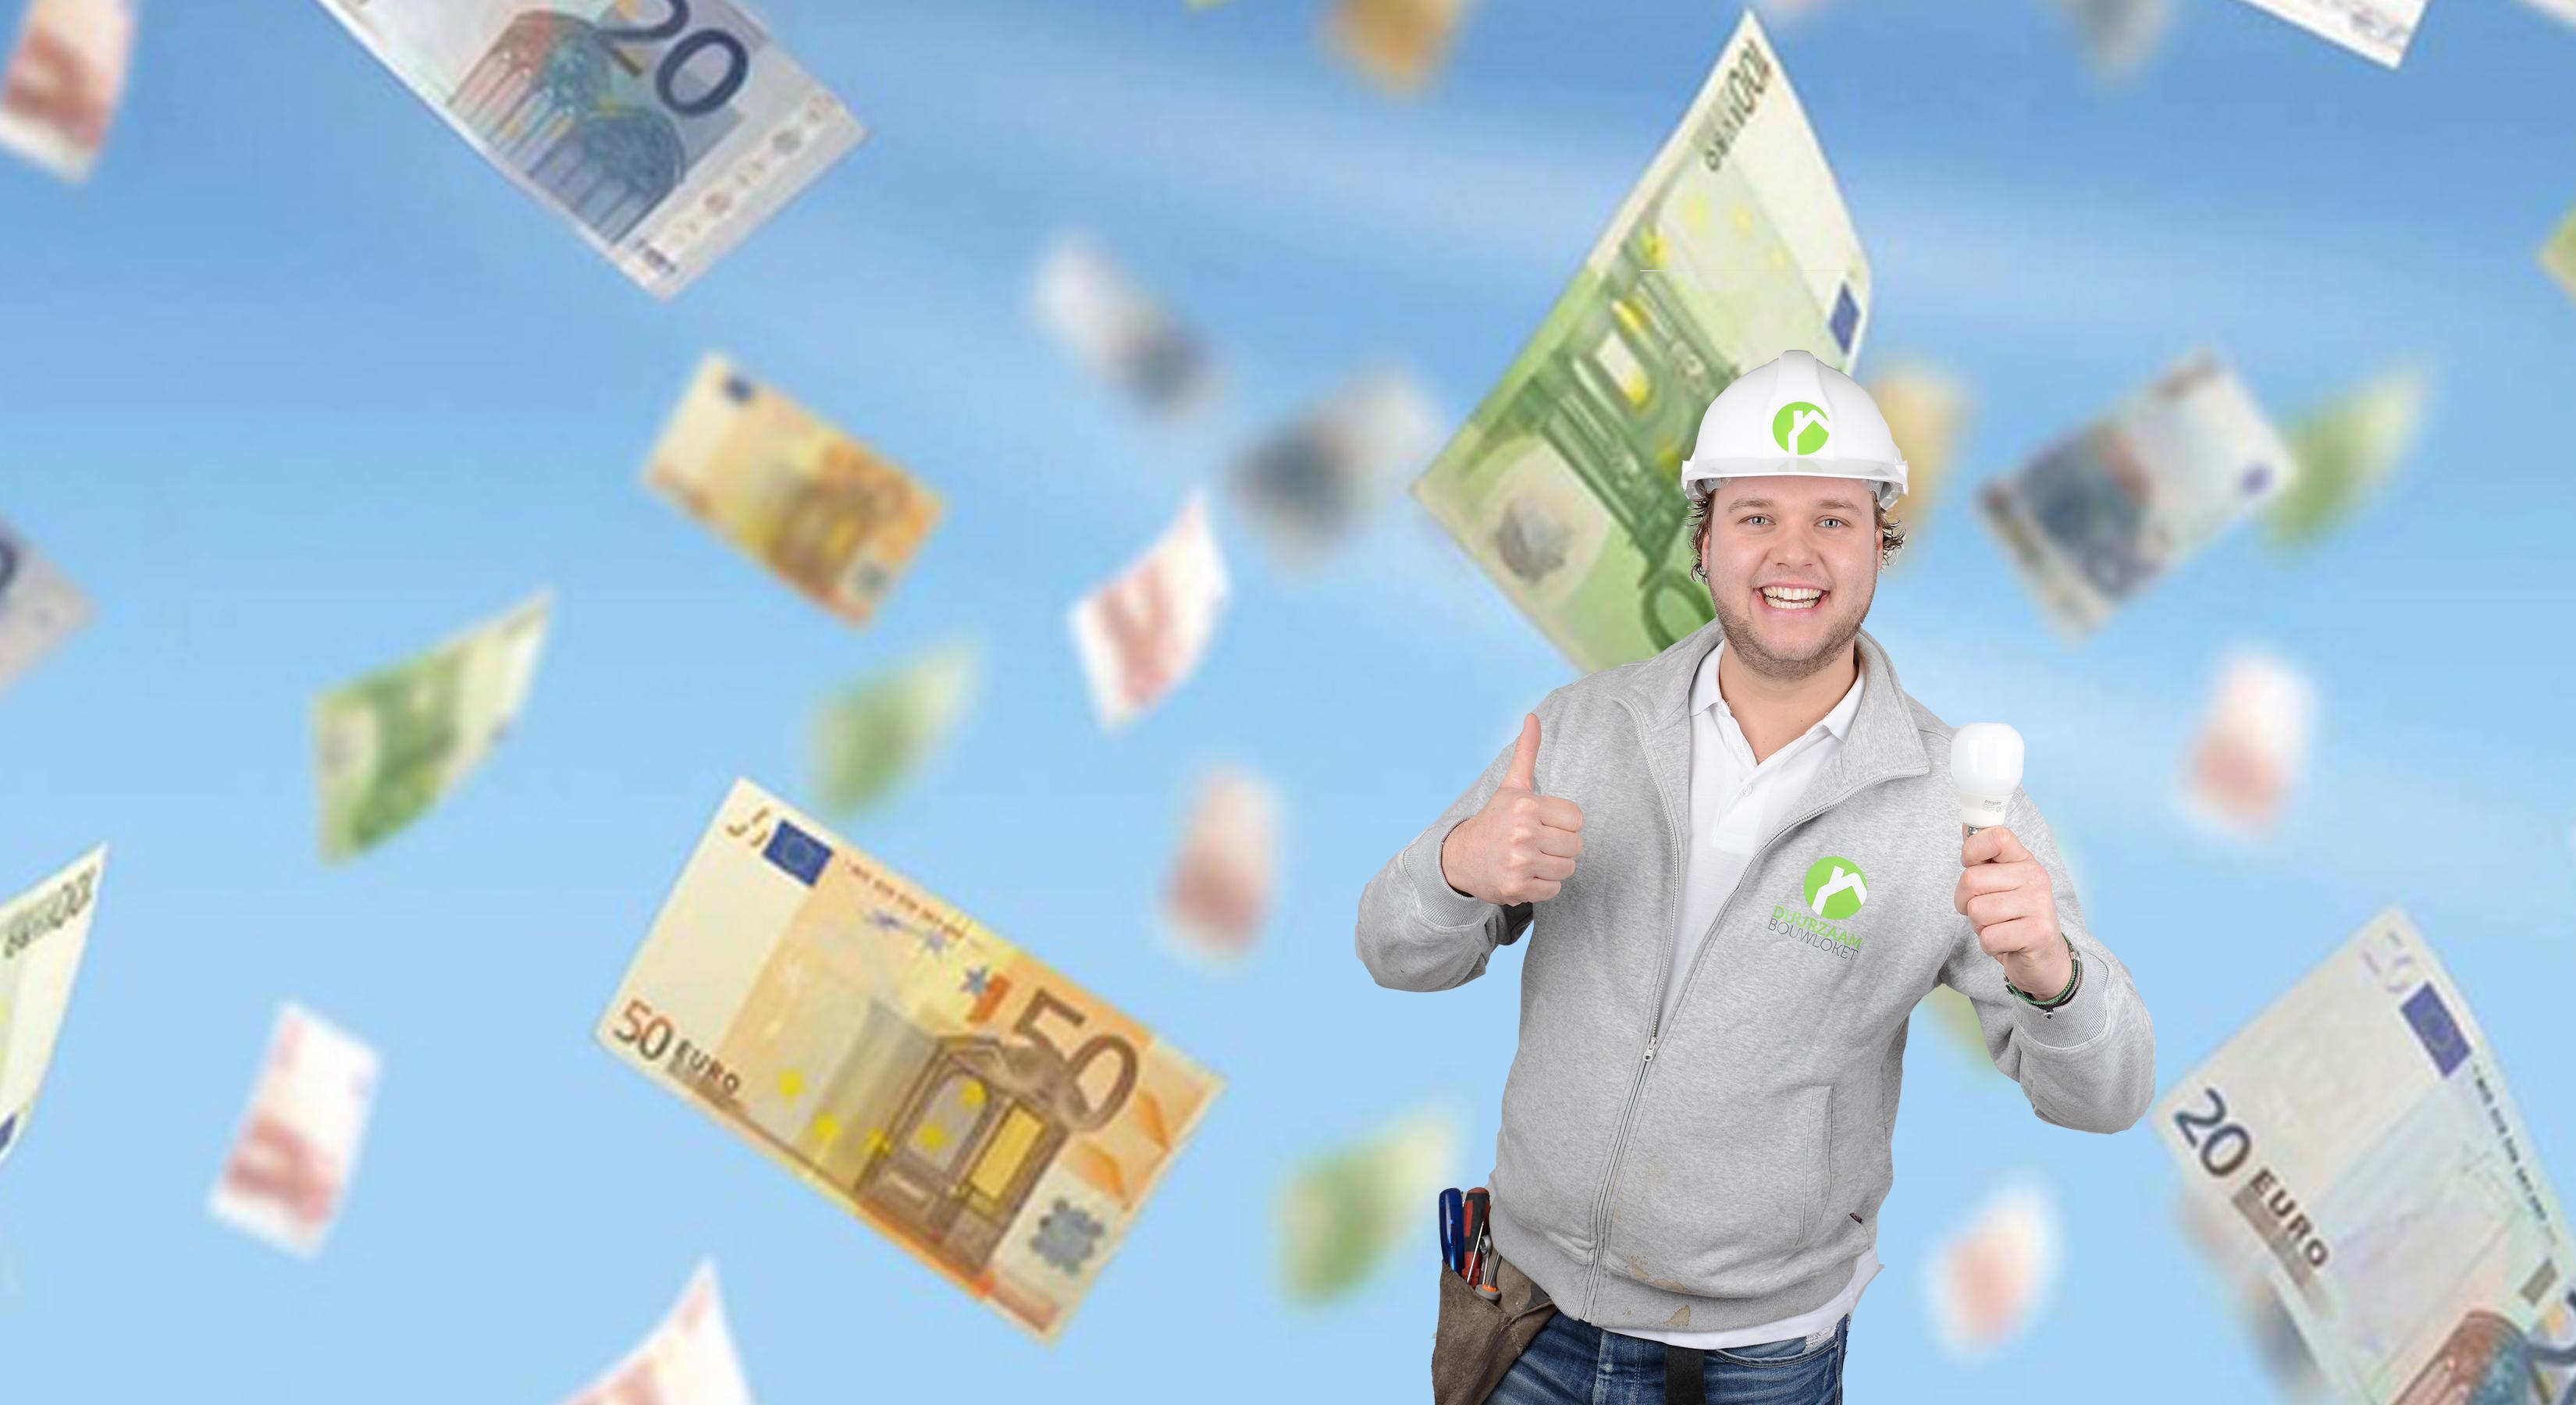 Afbeelding Subsidie Energievoucher Gemeente Venlo